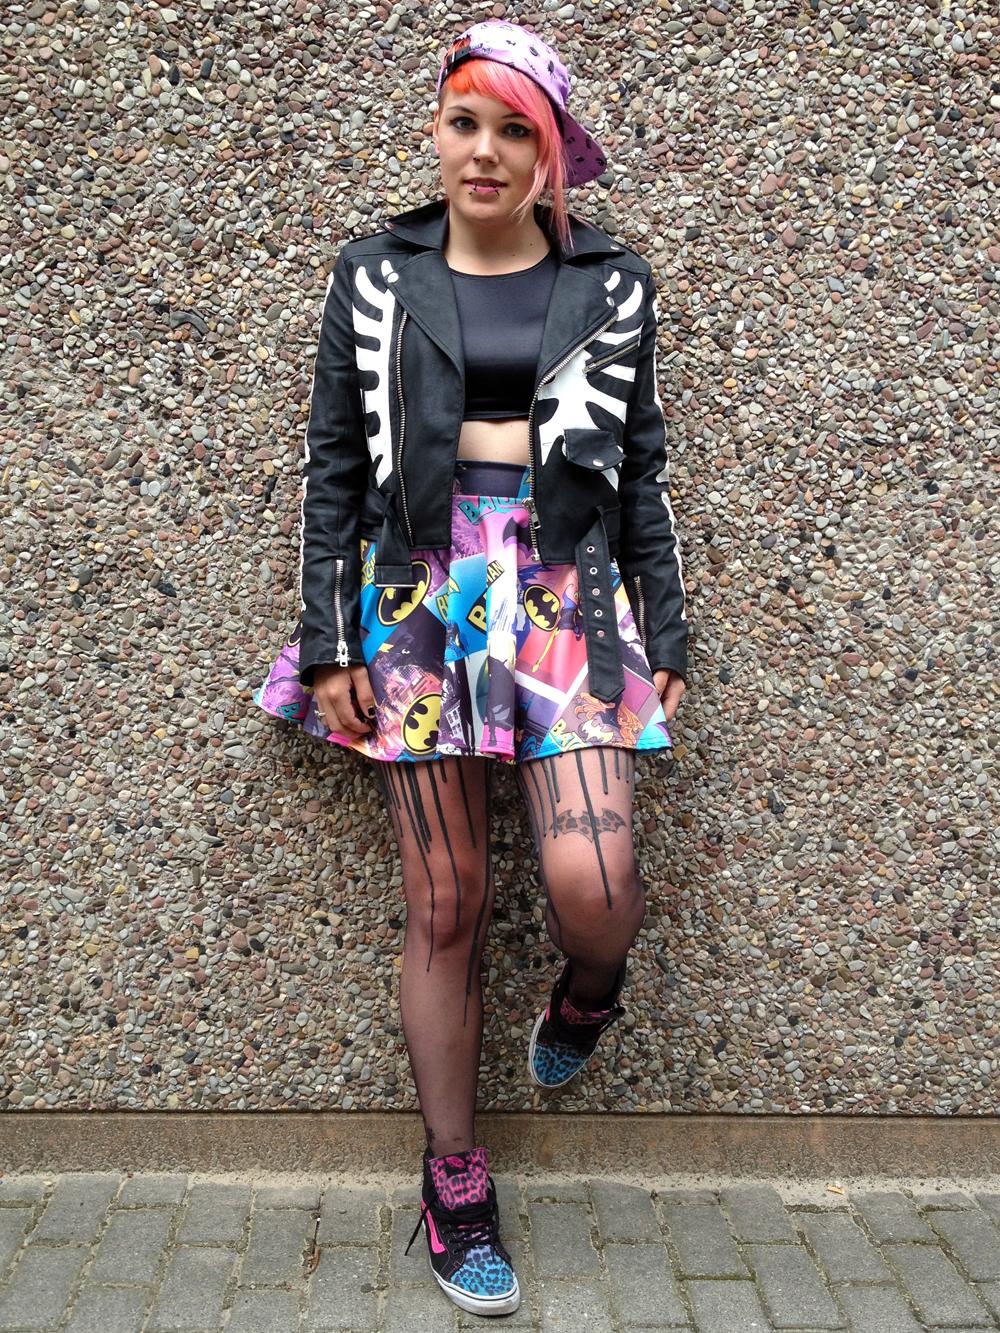 Karmaclothing, UNIF, VANS, URB Clothing, Glamour Kills